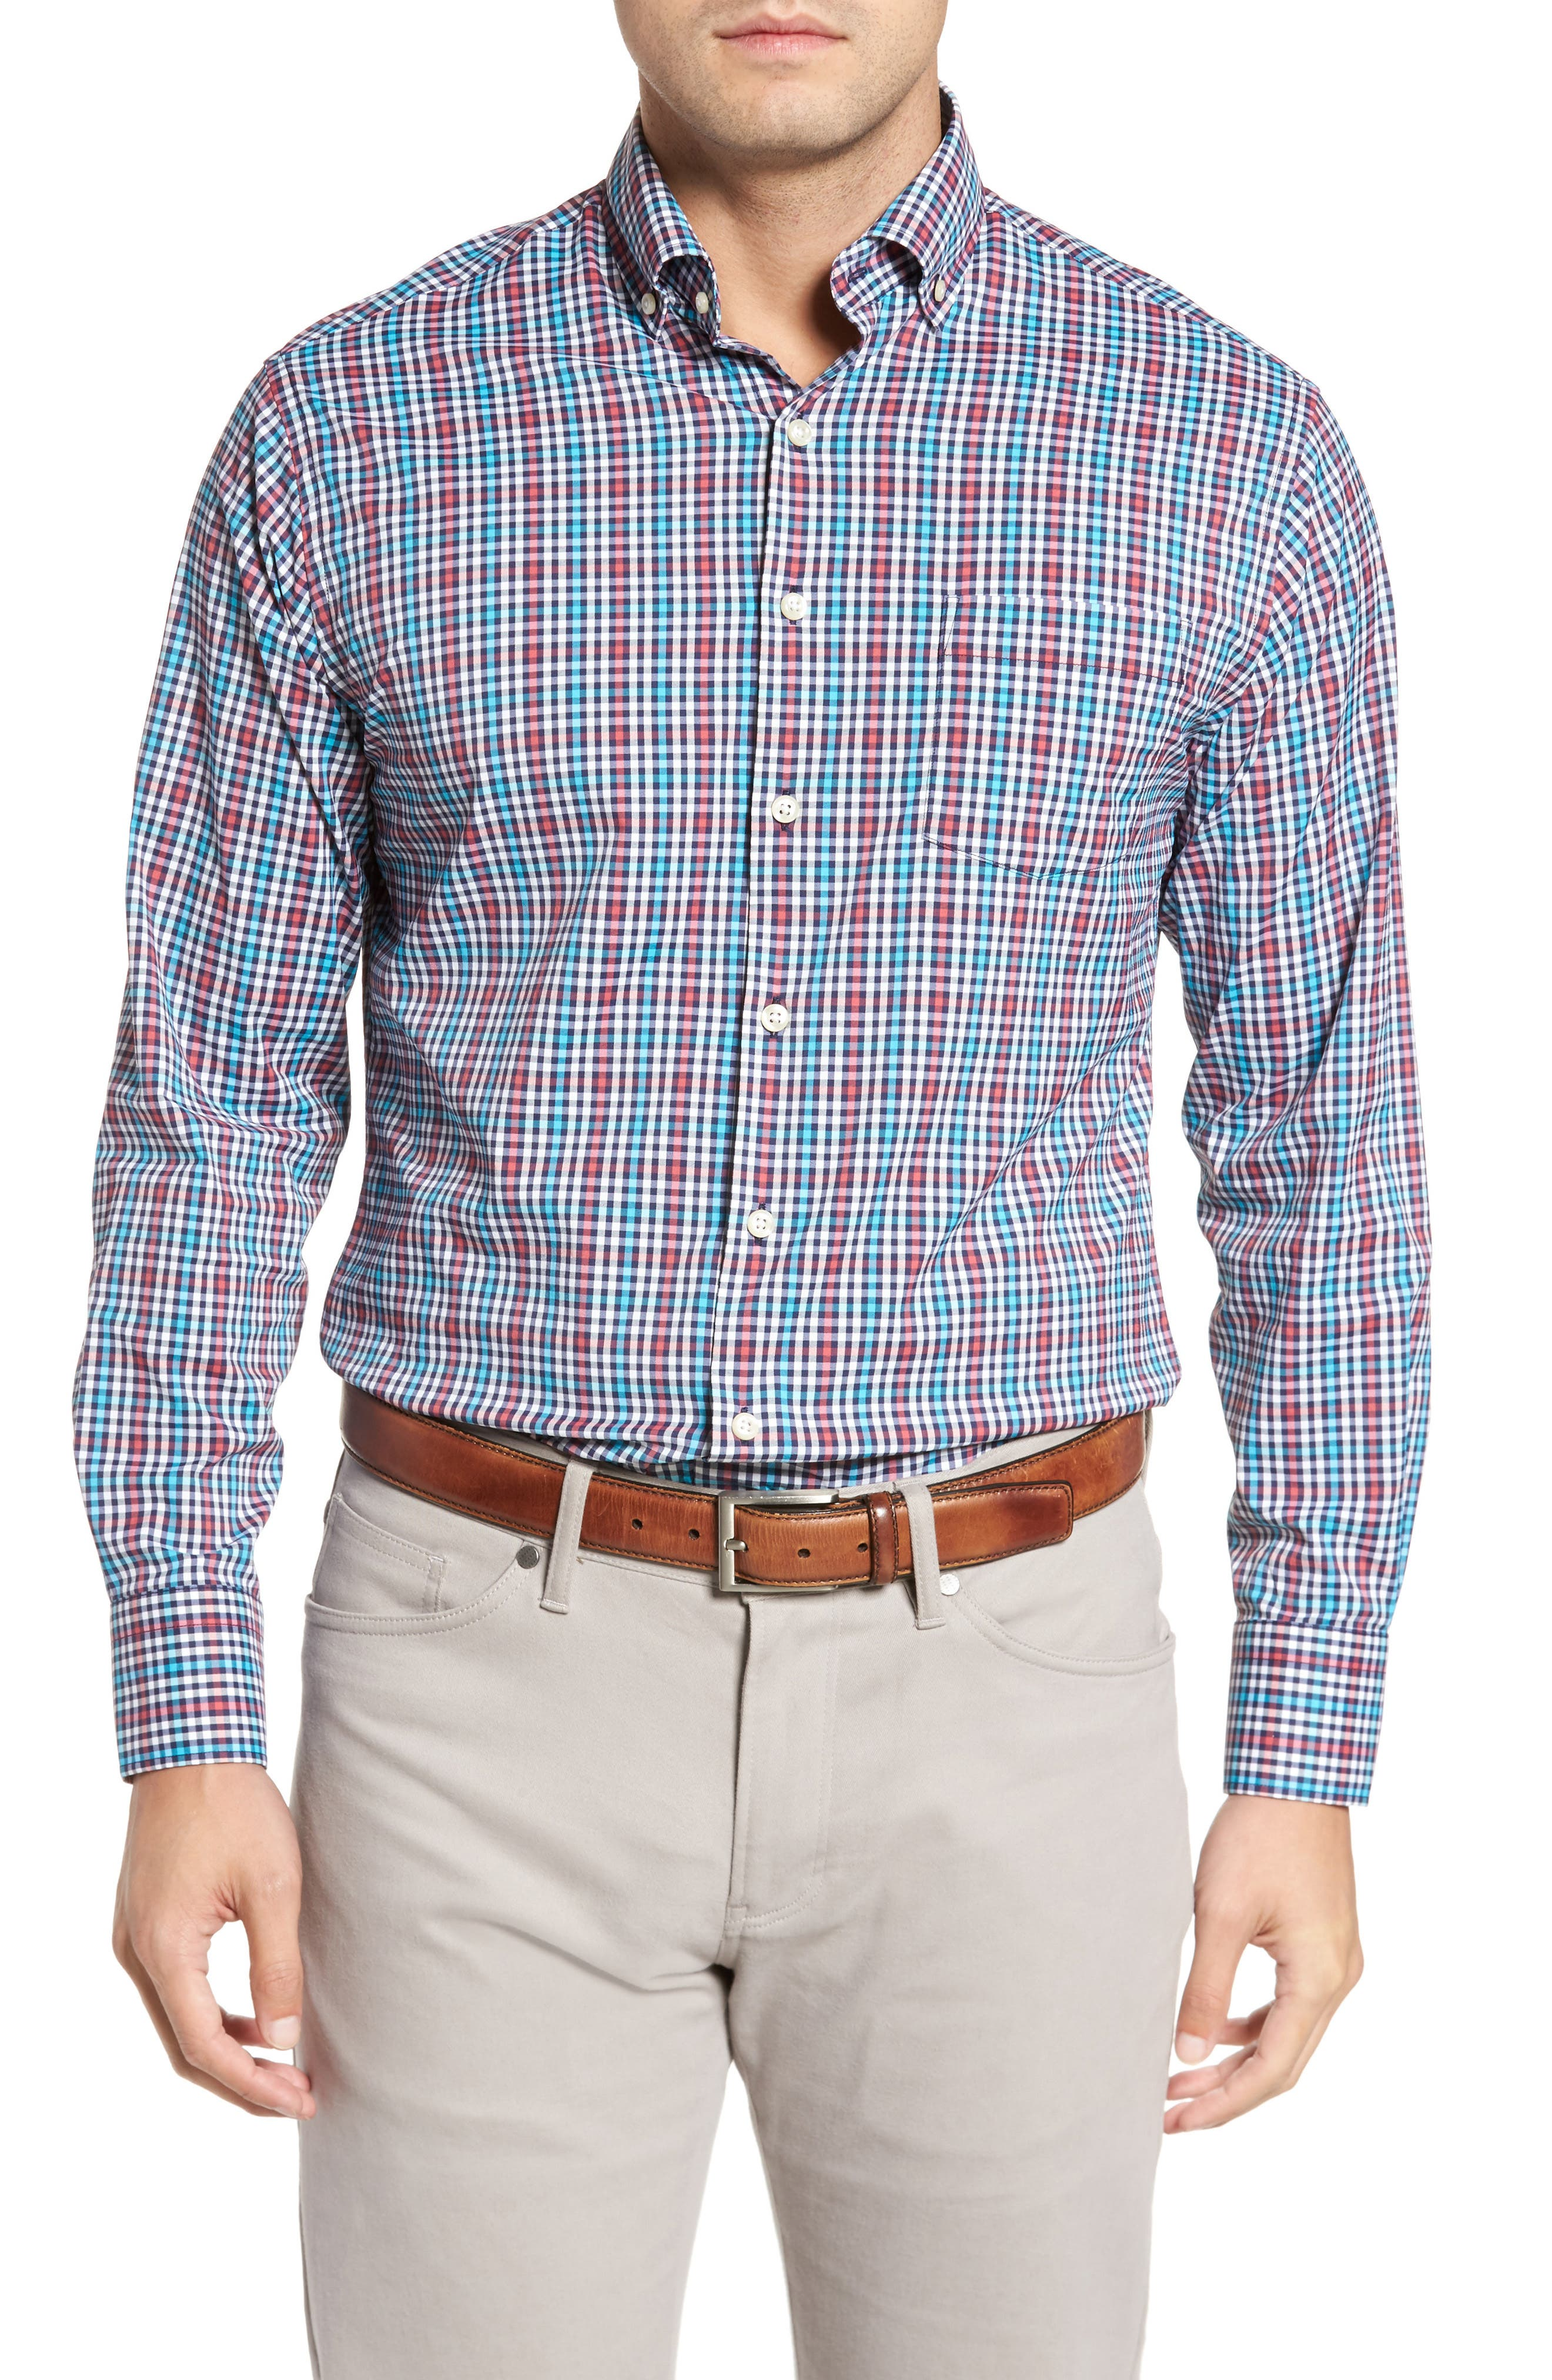 Collier Regular Fit Plaid Performance Sport Shirt,                         Main,                         color, Cape Red